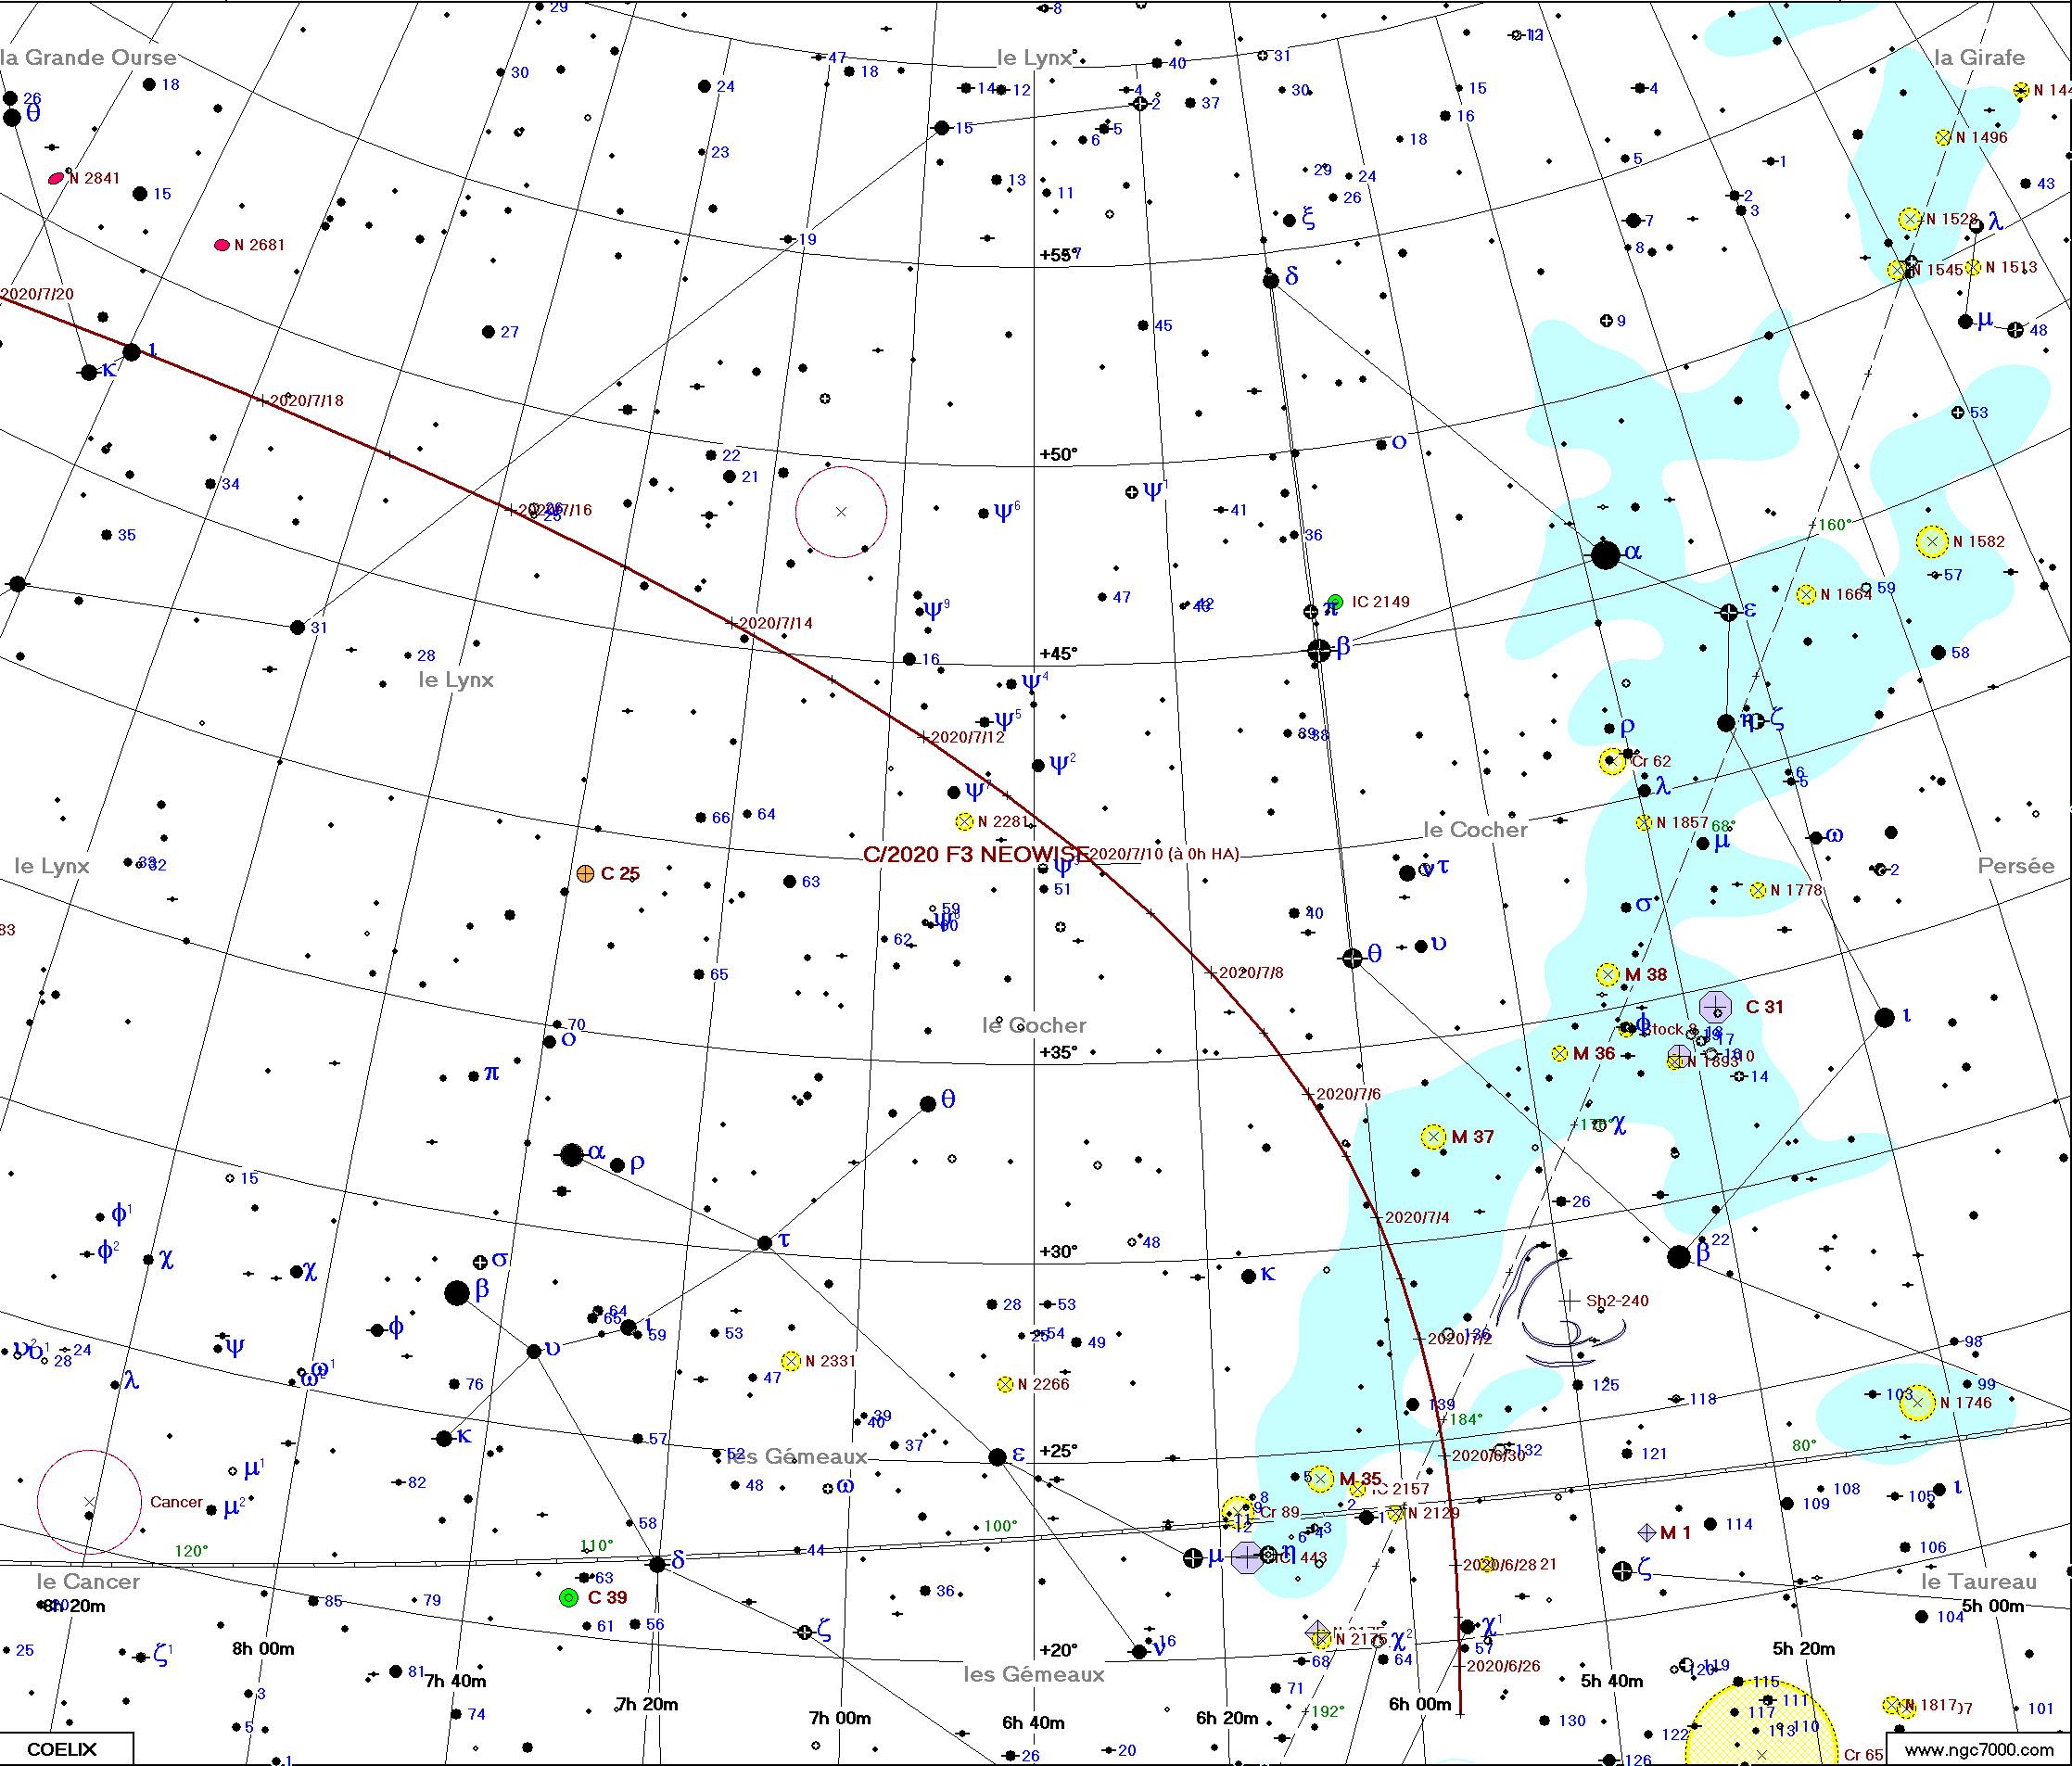 Comète C/2020 F3 NEOWISE Trajectoire